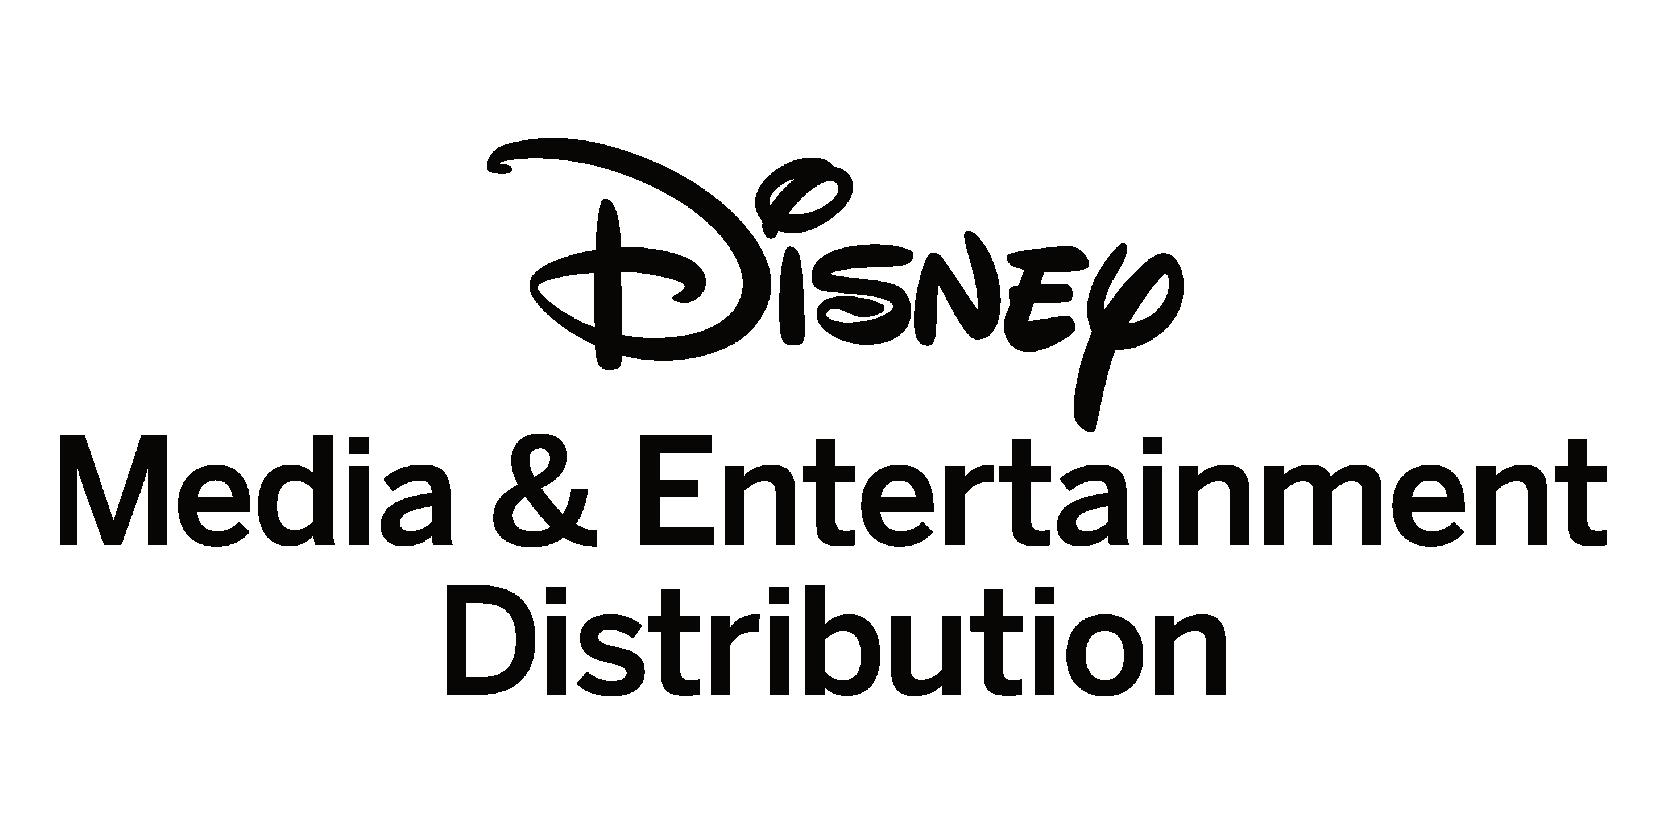 Disney Media & Entertainment Distribution